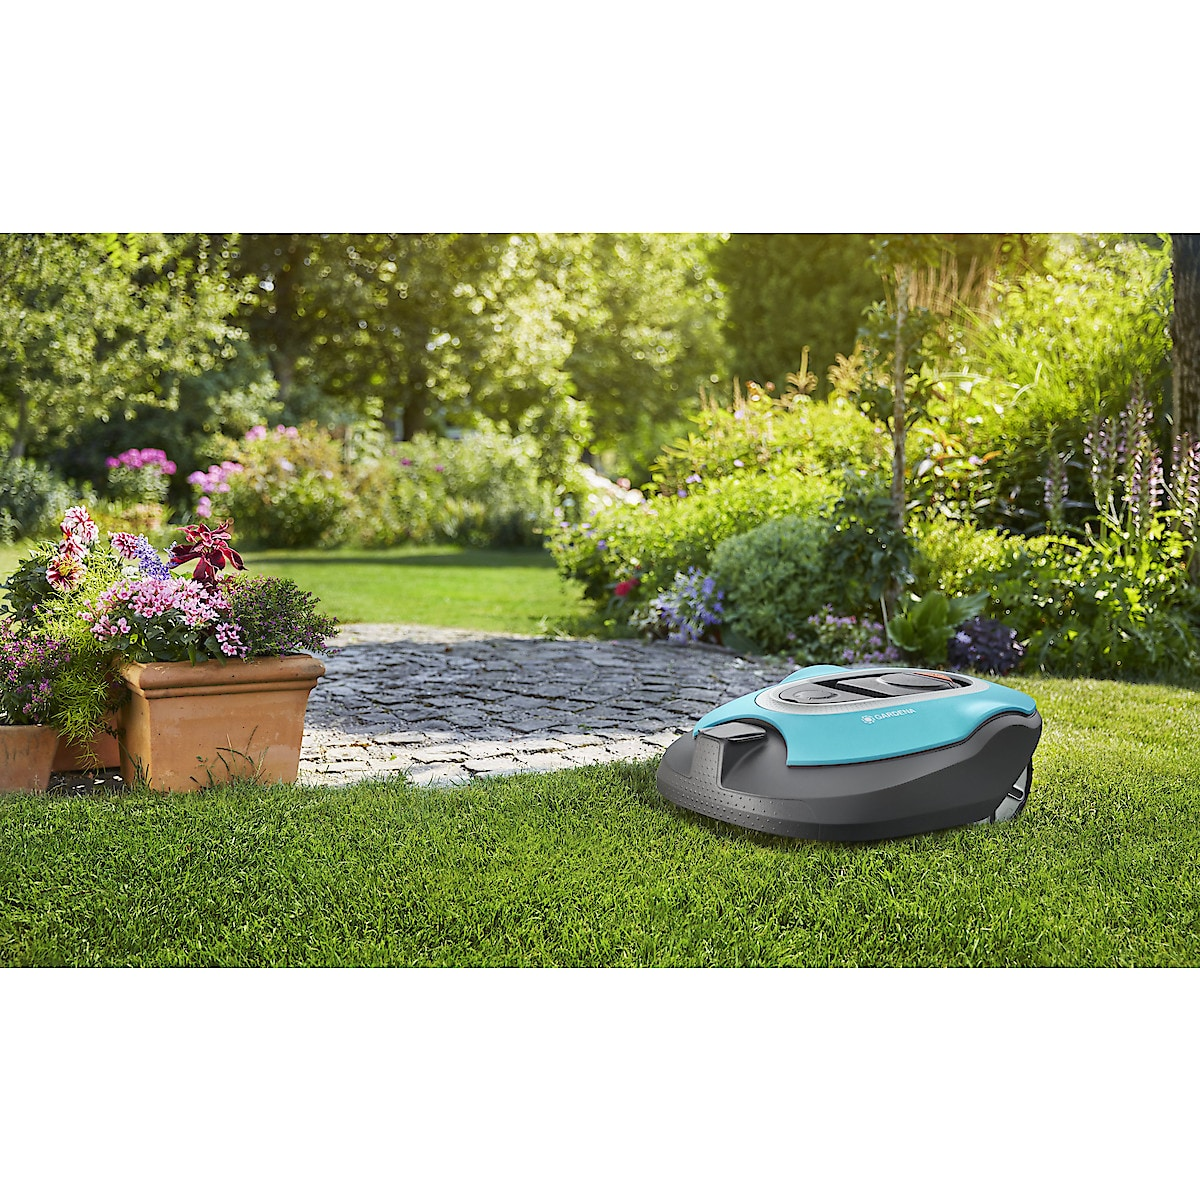 Gardena Sileno robotgressklipper